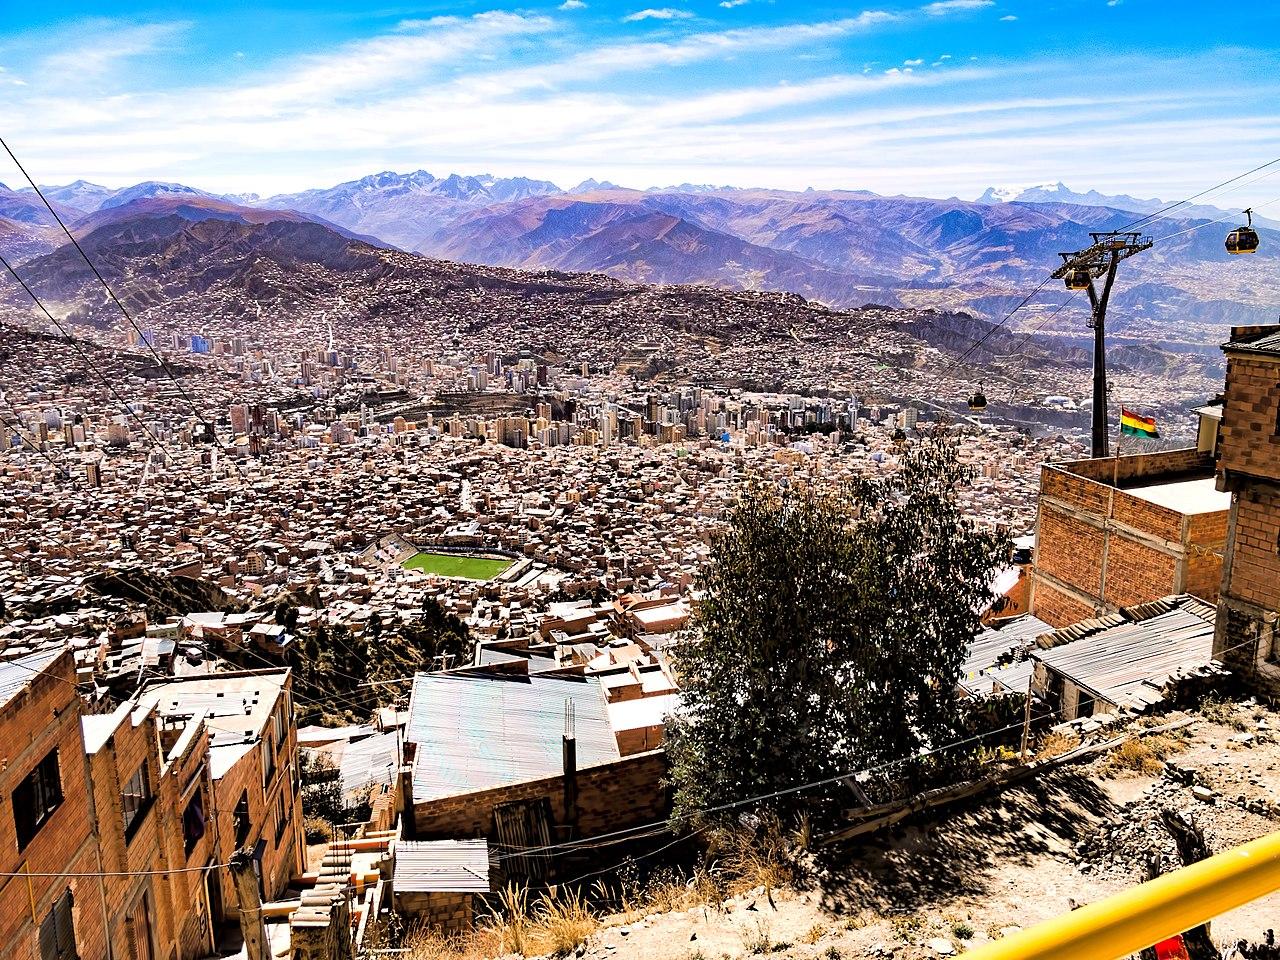 20170812 Bolivia 1772 La Paz sRGB (37926540966).jpg